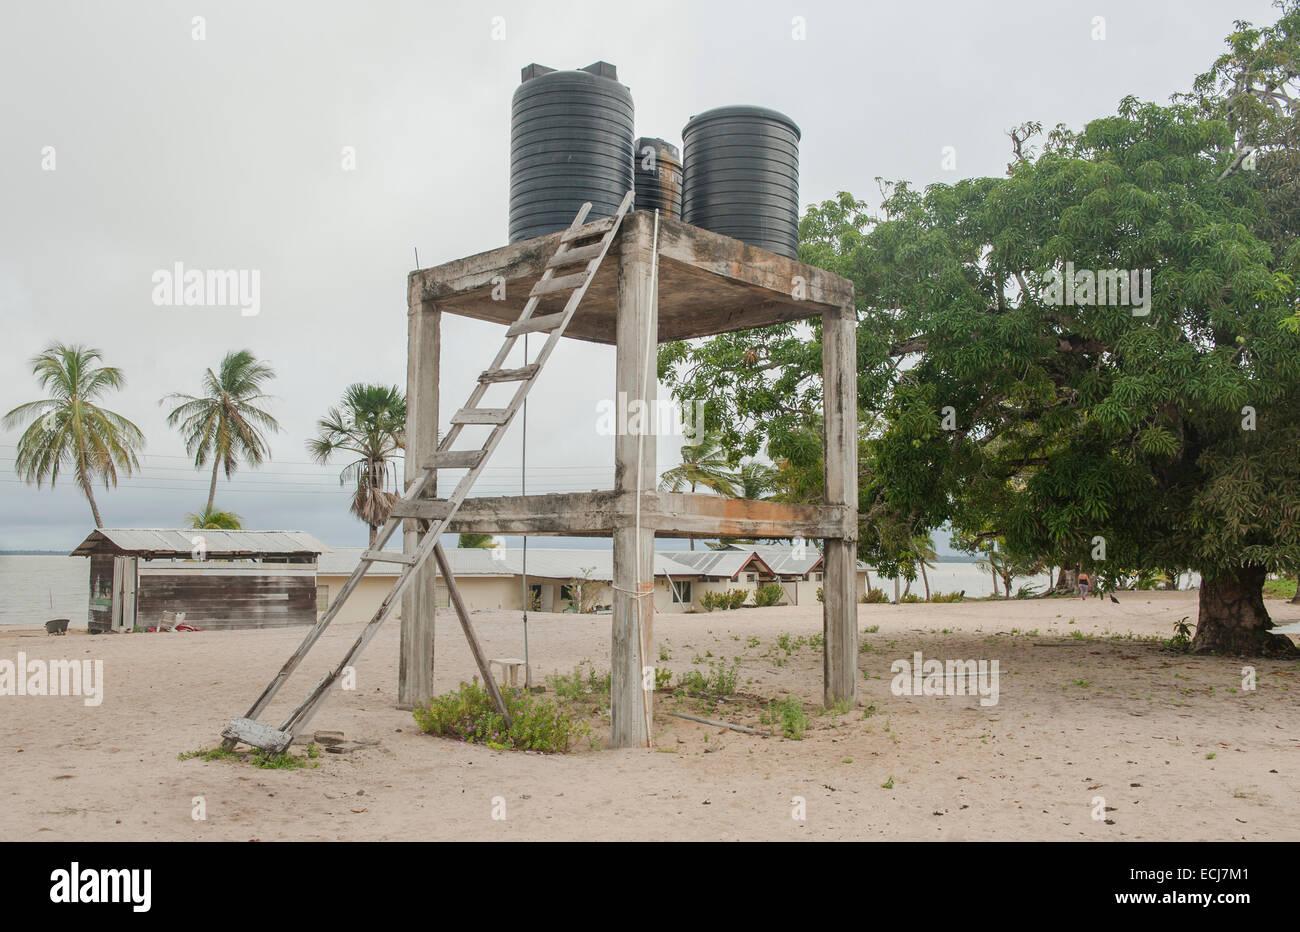 Water reservoir at the Amerindian village of Christiaankondre, Galibi, Suriname - Stock Image